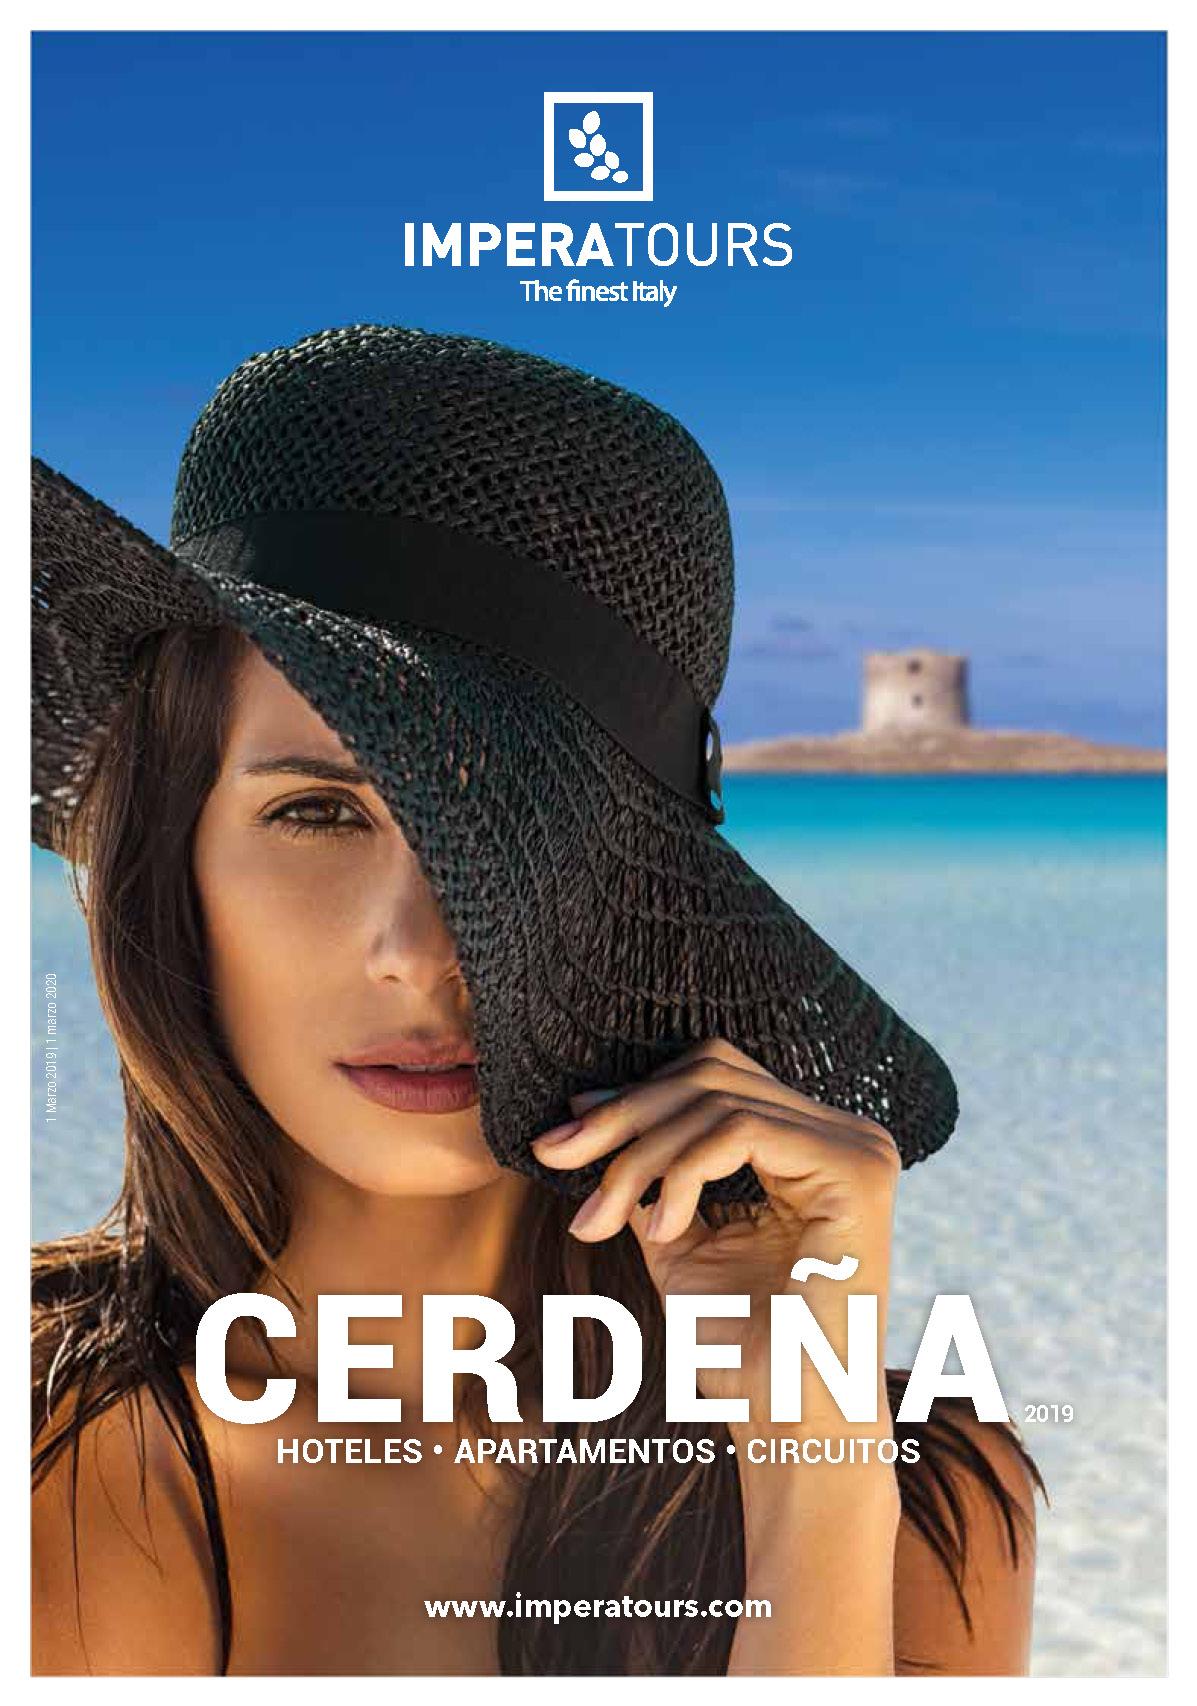 Catalogo Imperatours Cerdeña 2019